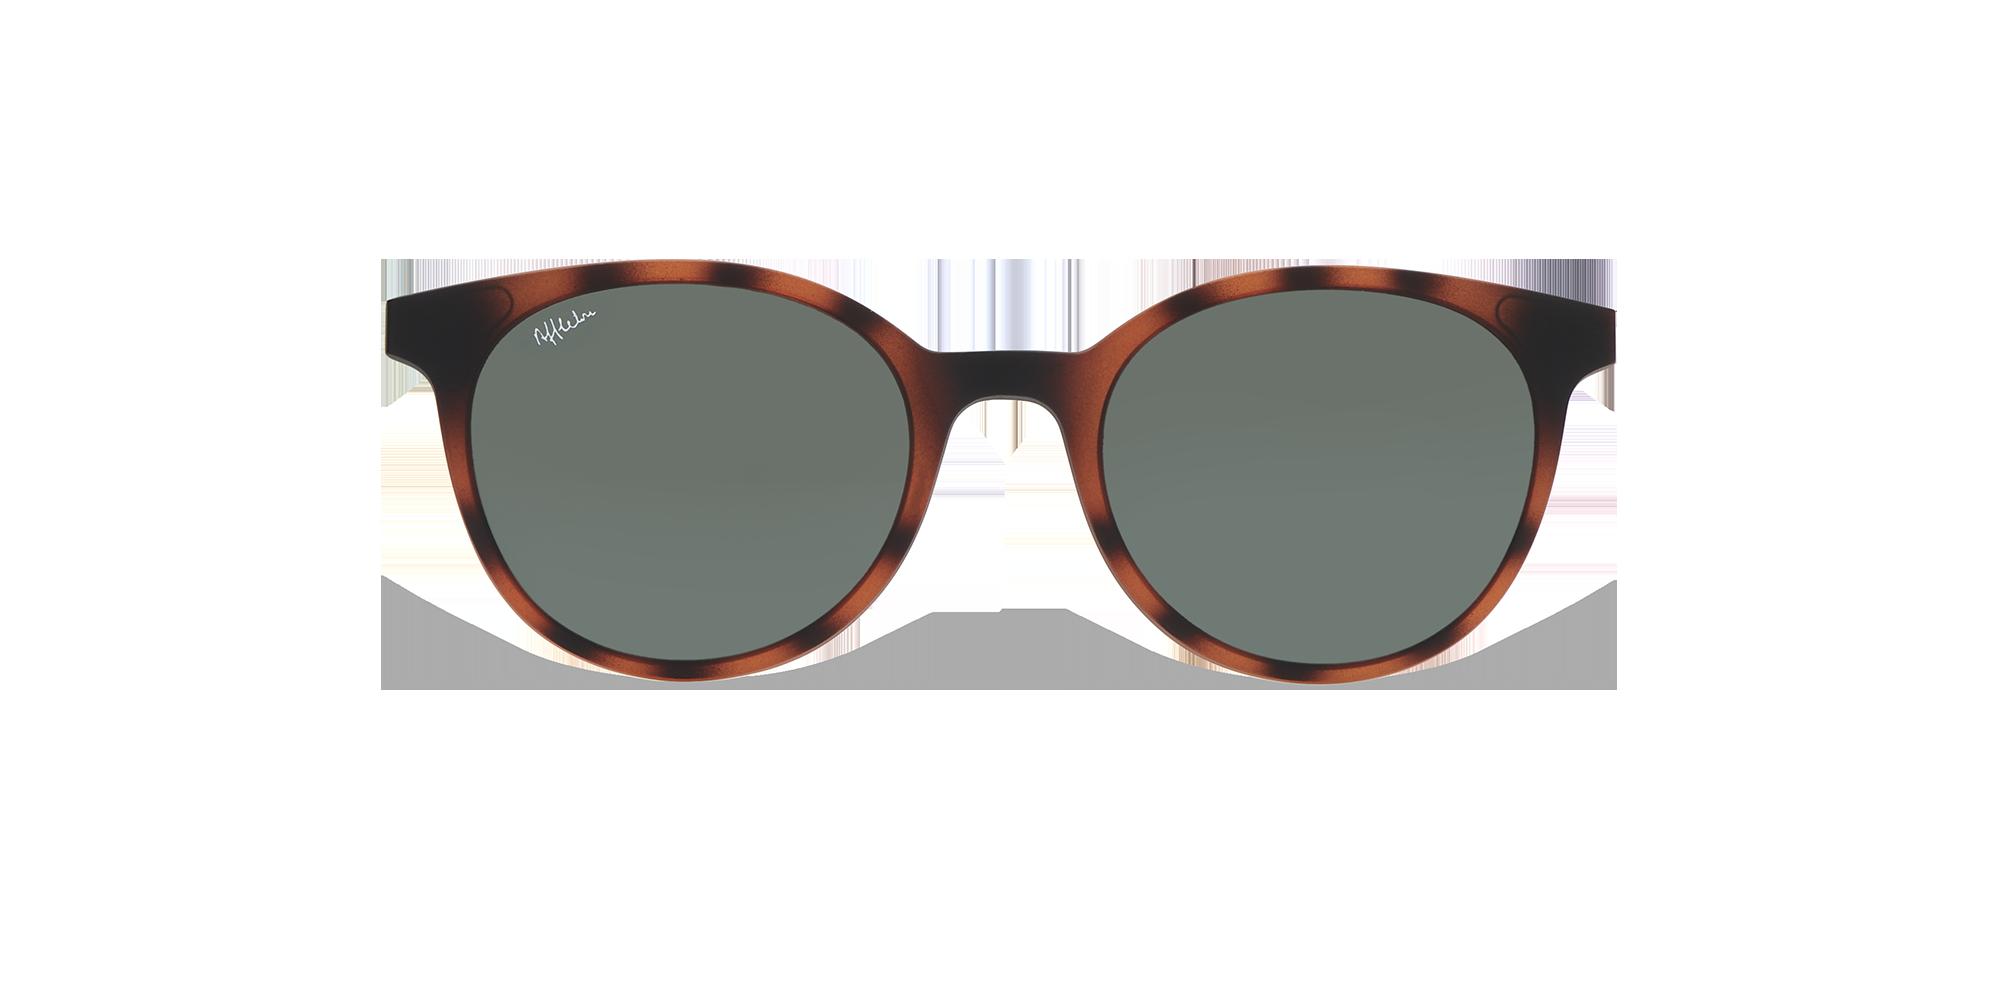 afflelou/france/products/smart_clip/clips_glasses/TMK36POTO014819.png